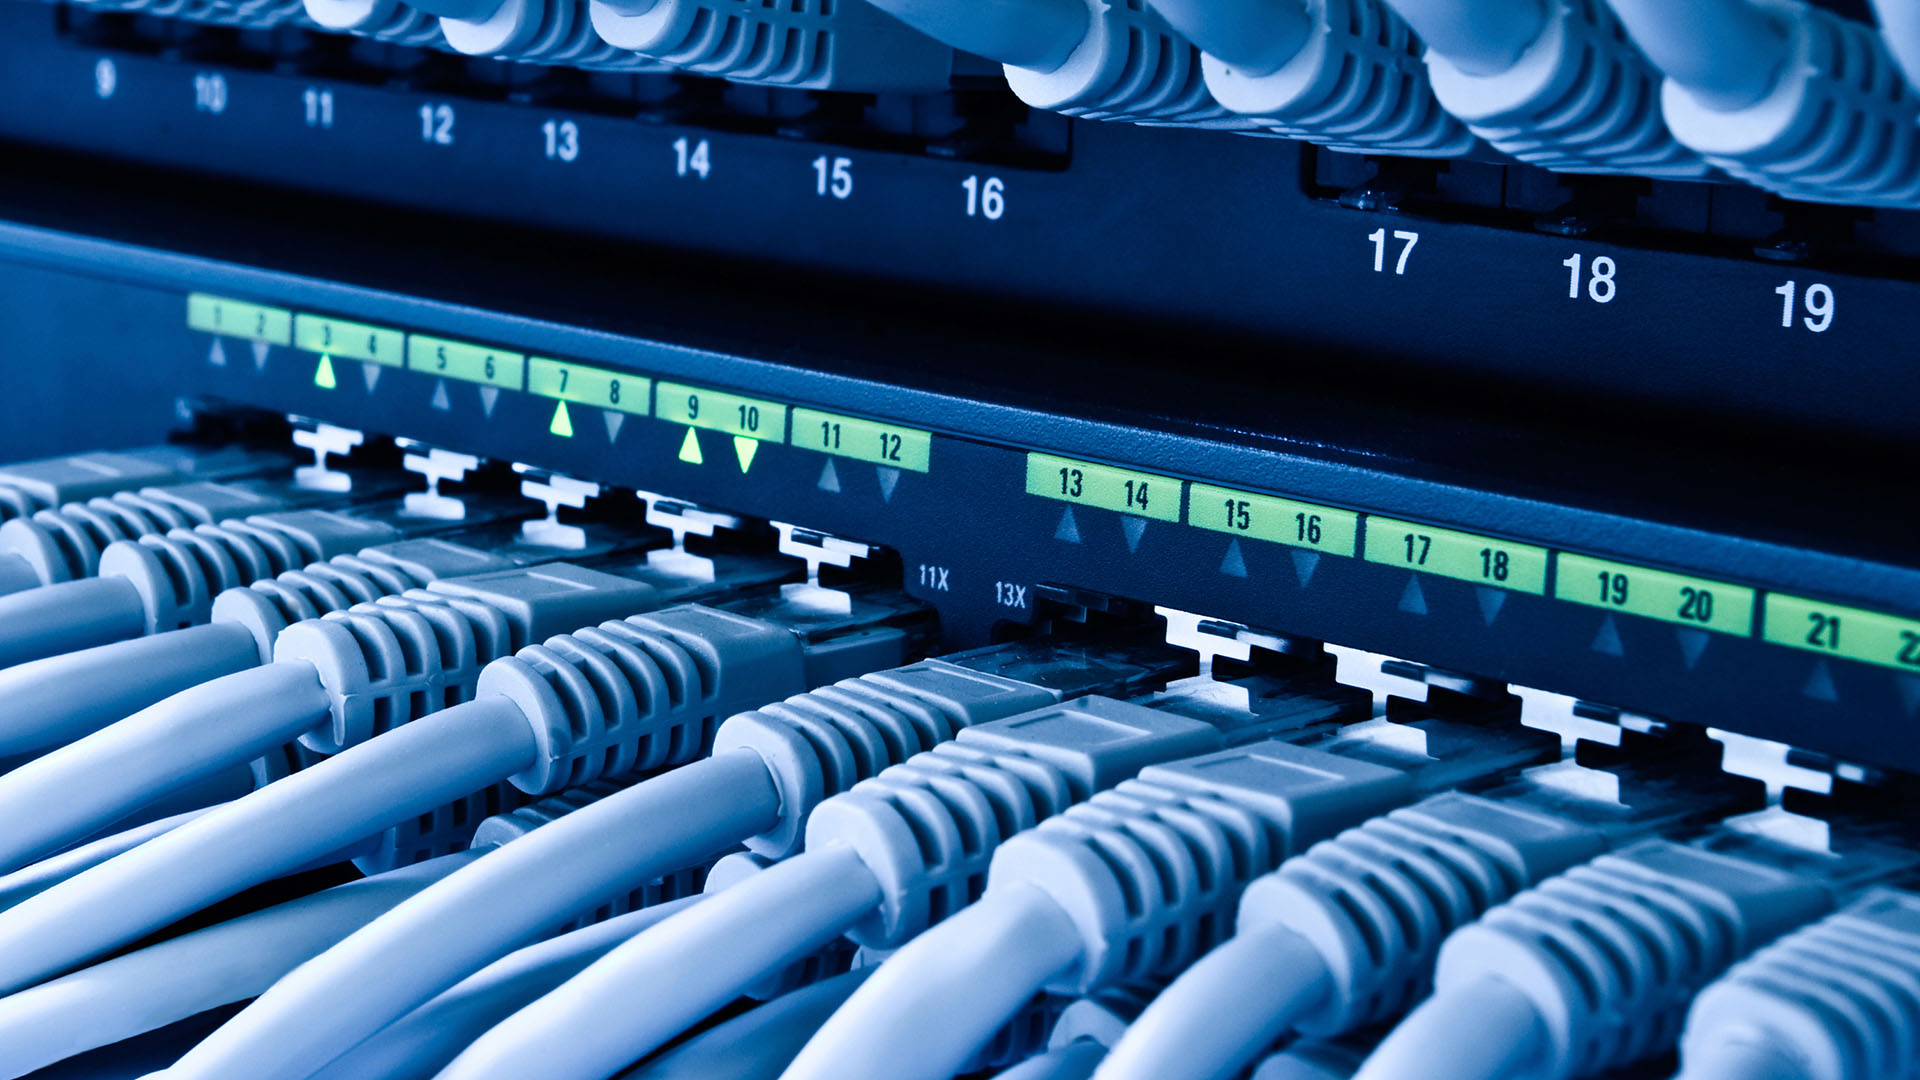 Lantana Florida Superior Voice & Data Network Cabling Solutions